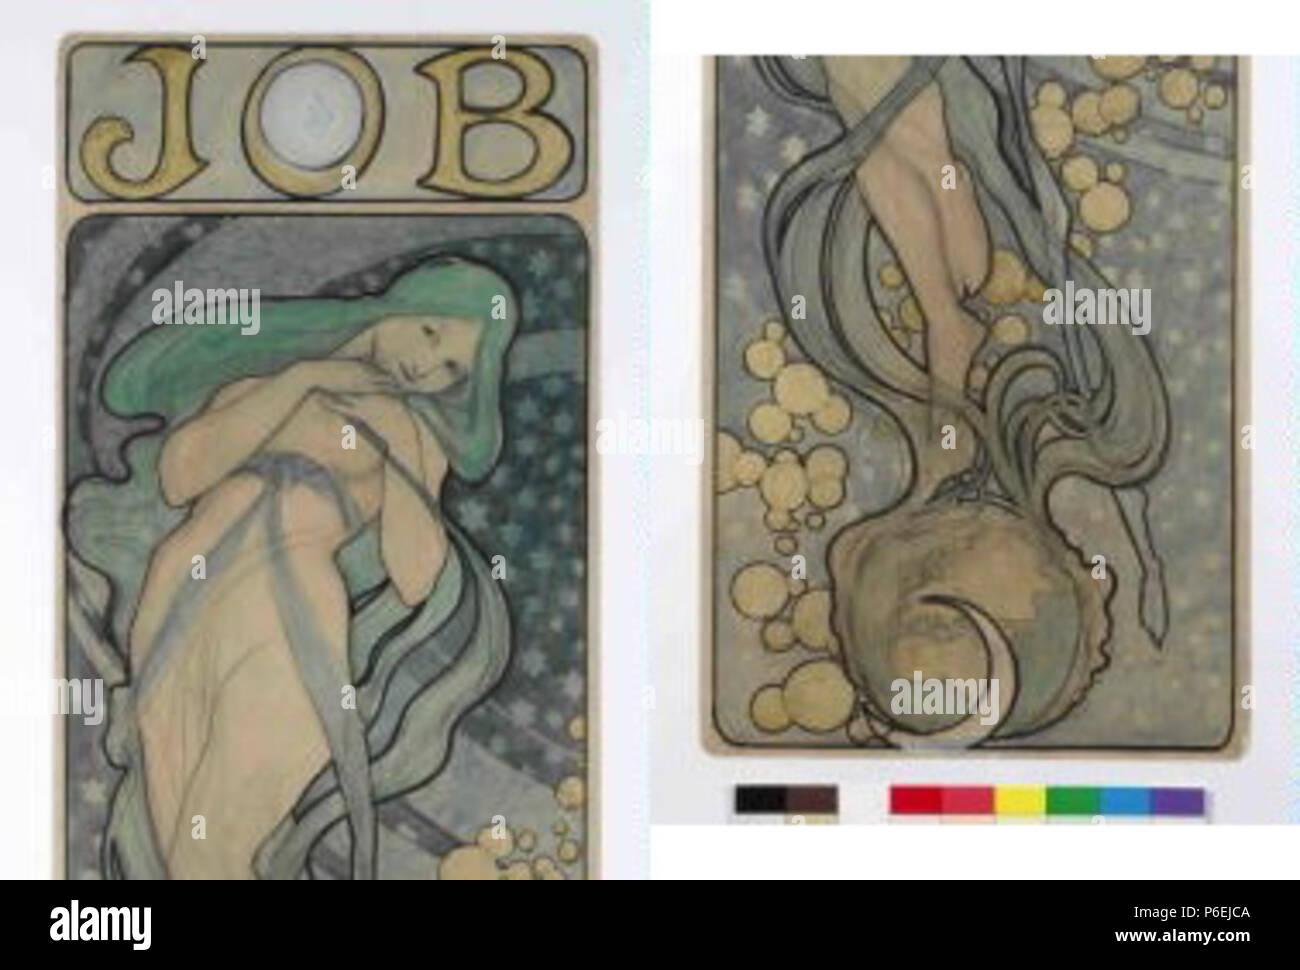 .  eština: Návrh na plakát JOB  circa 1897 6 Autor Alfons Mucha 24.7.1860-14.7.1939 - Navrh na plakat JOB Stock Photo